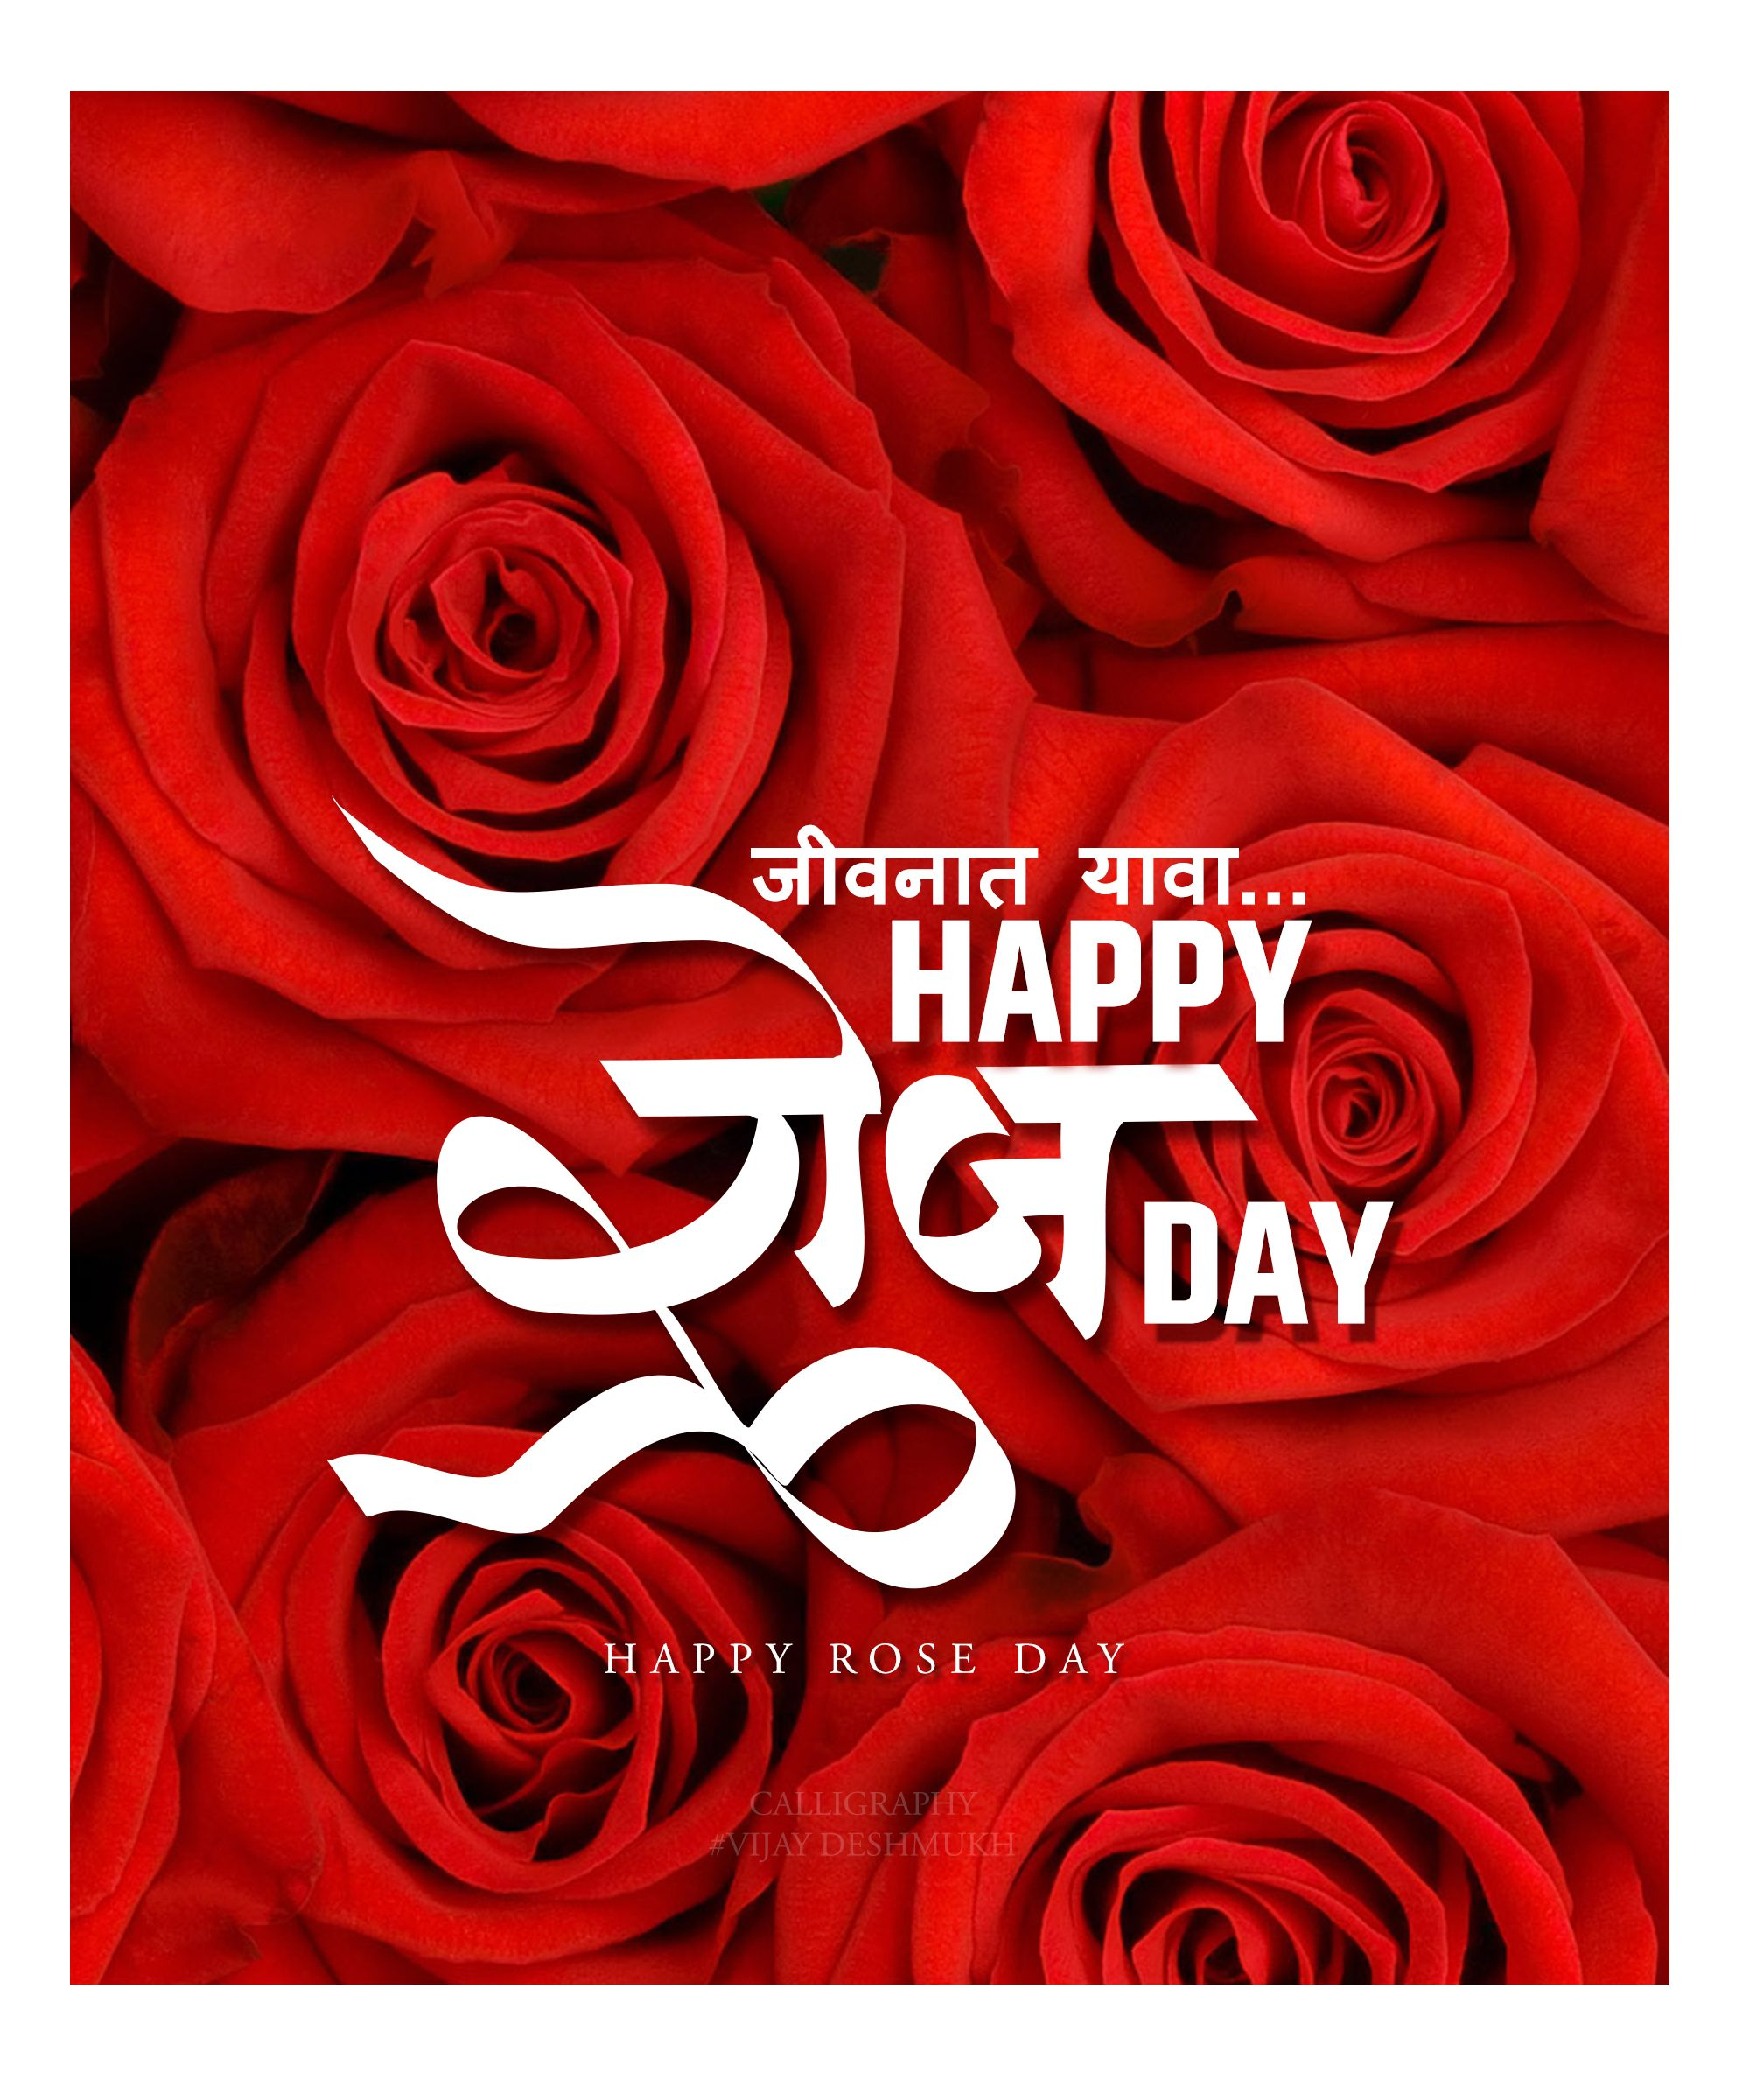 Happy Rose Day Marathi Calligrphy By Vijay Deshmukh Rose Flowers Day